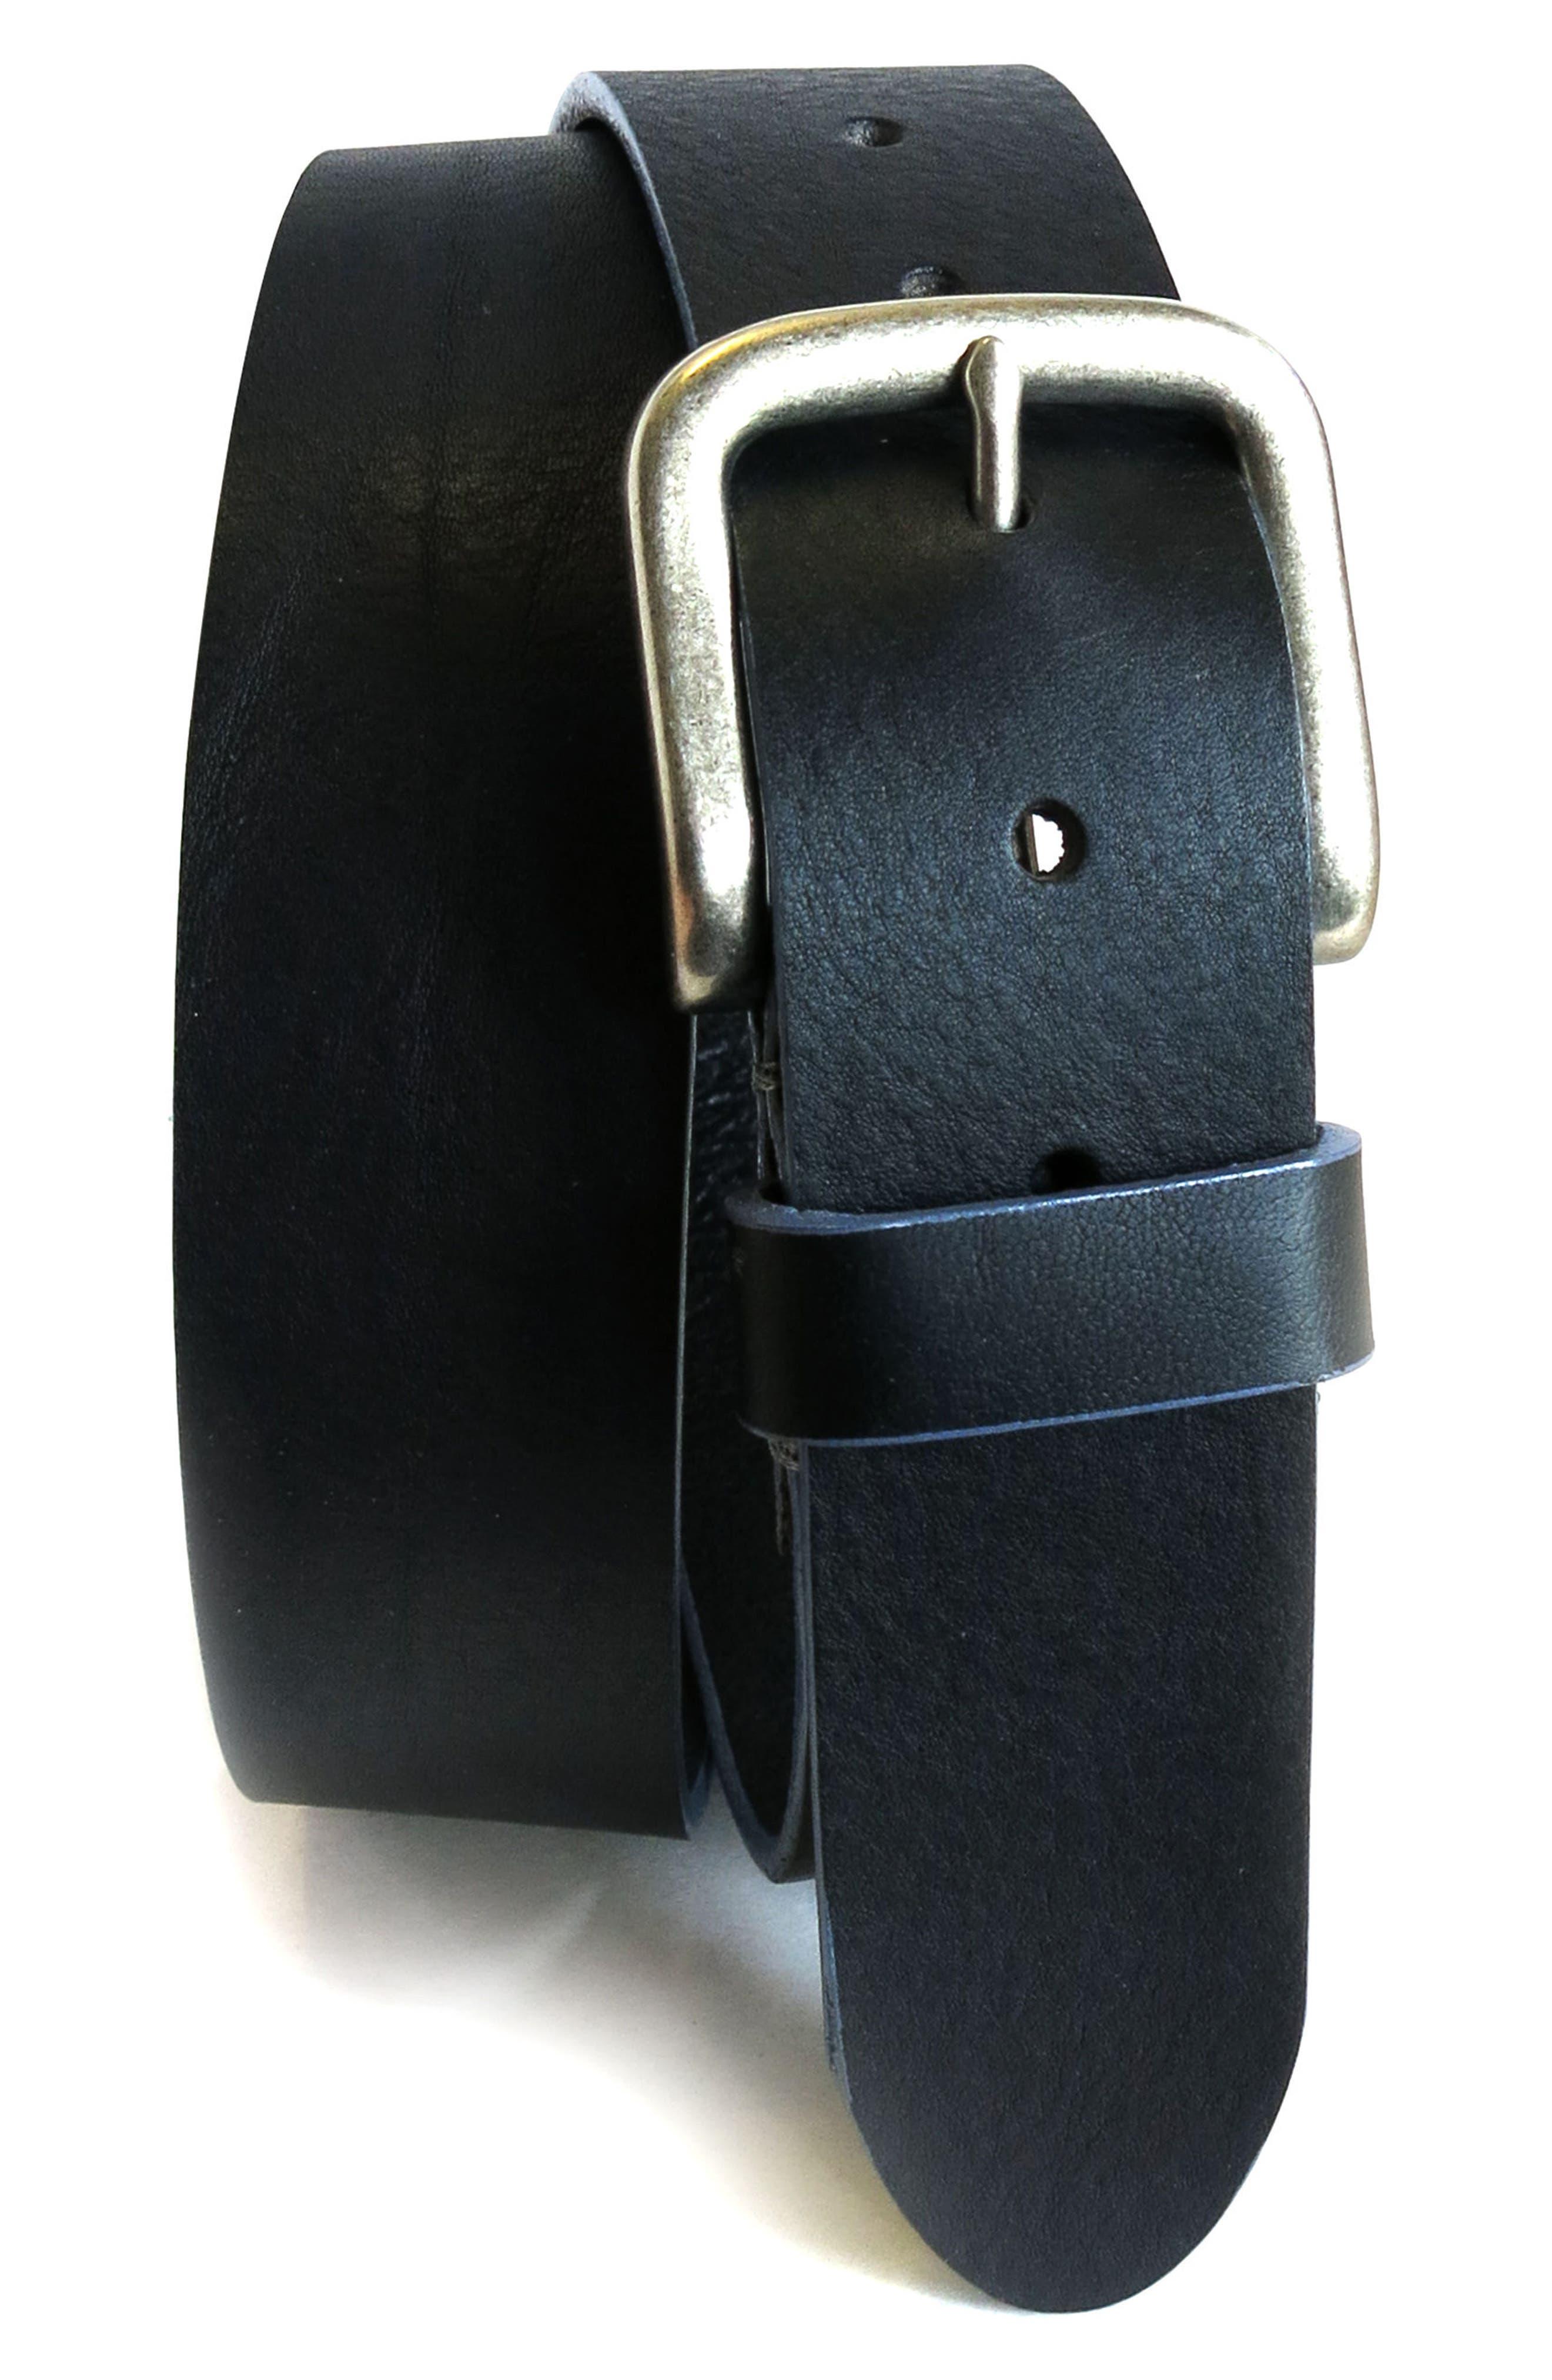 'Bastian' Bison Leather Belt,                             Main thumbnail 1, color,                             BLACK